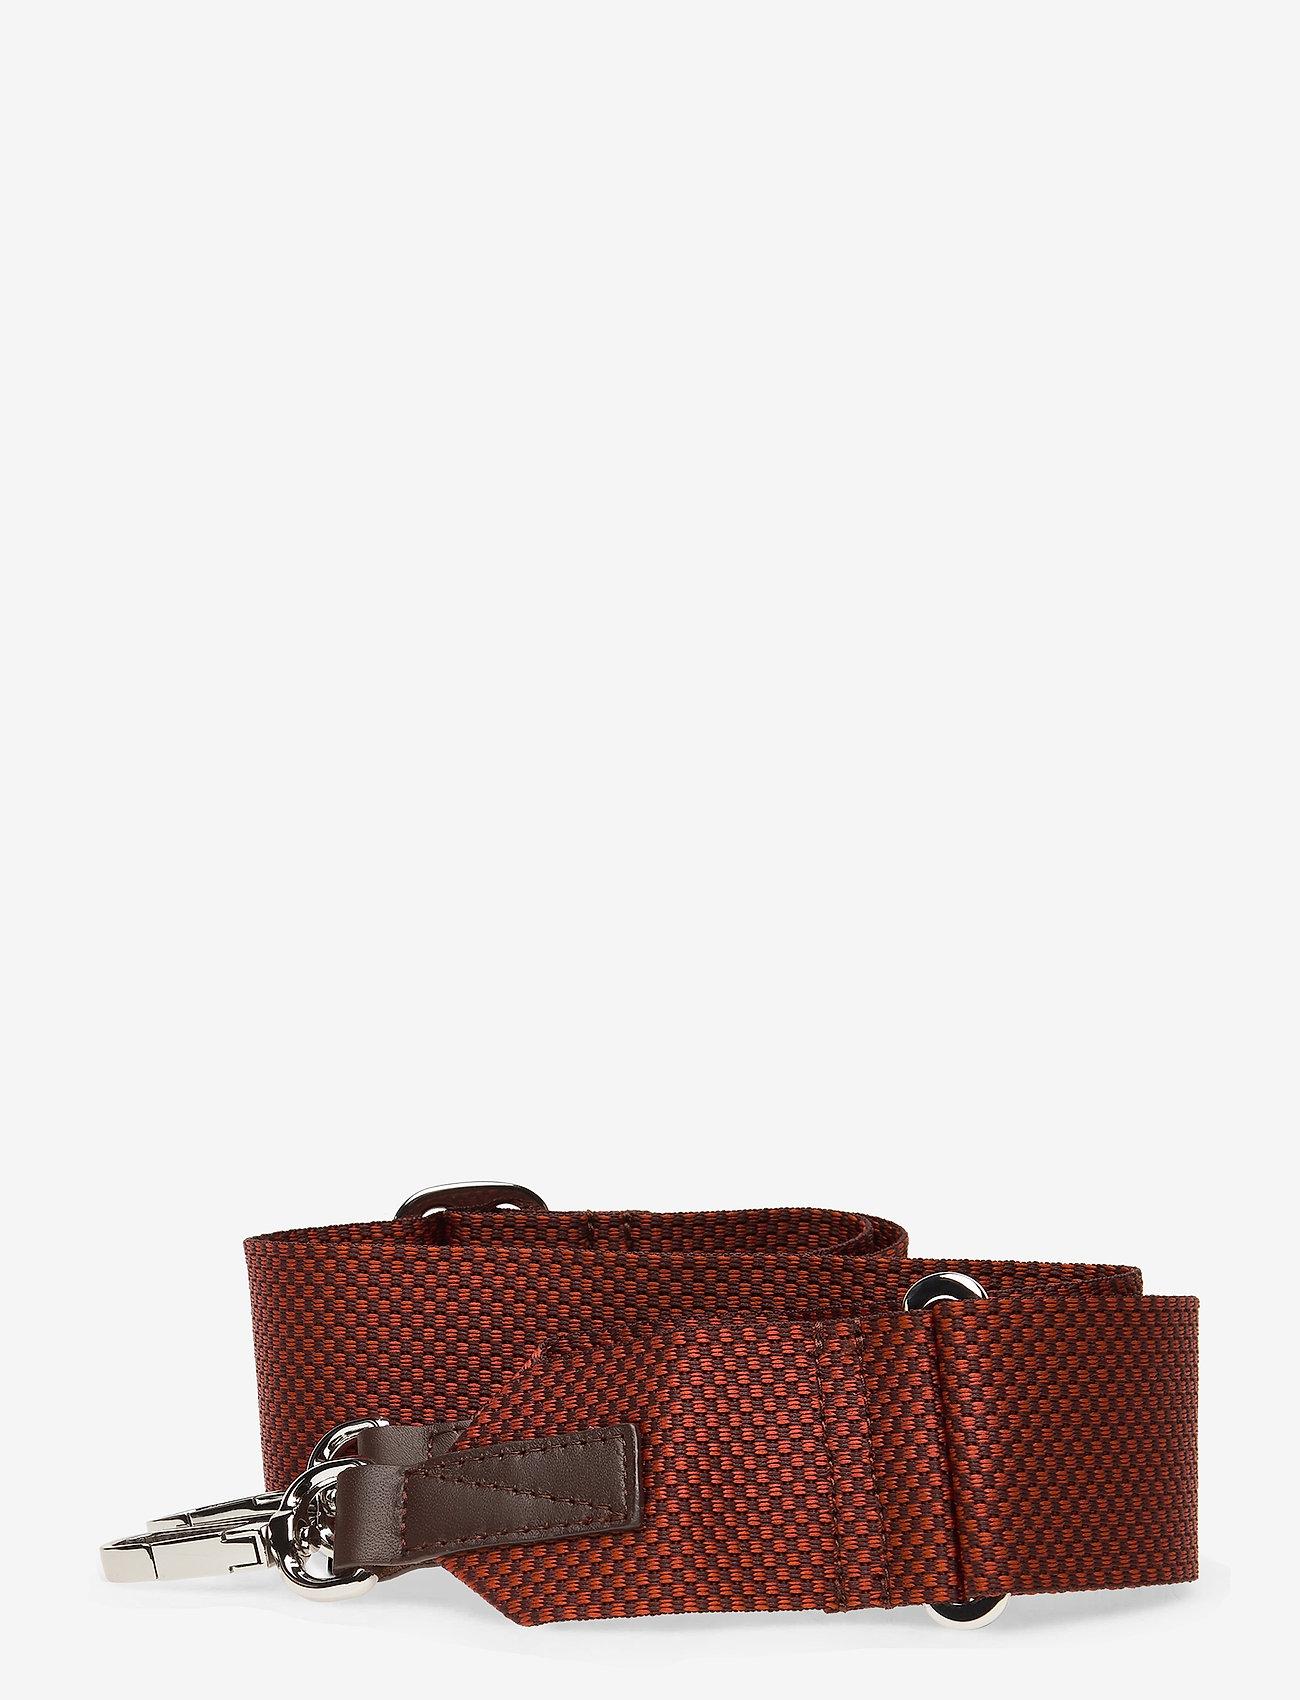 SANDQVIST - ADJUSTABLE SHOULDER STRAP - laukun hihnat - red / brown melange with dark brown leather - 0